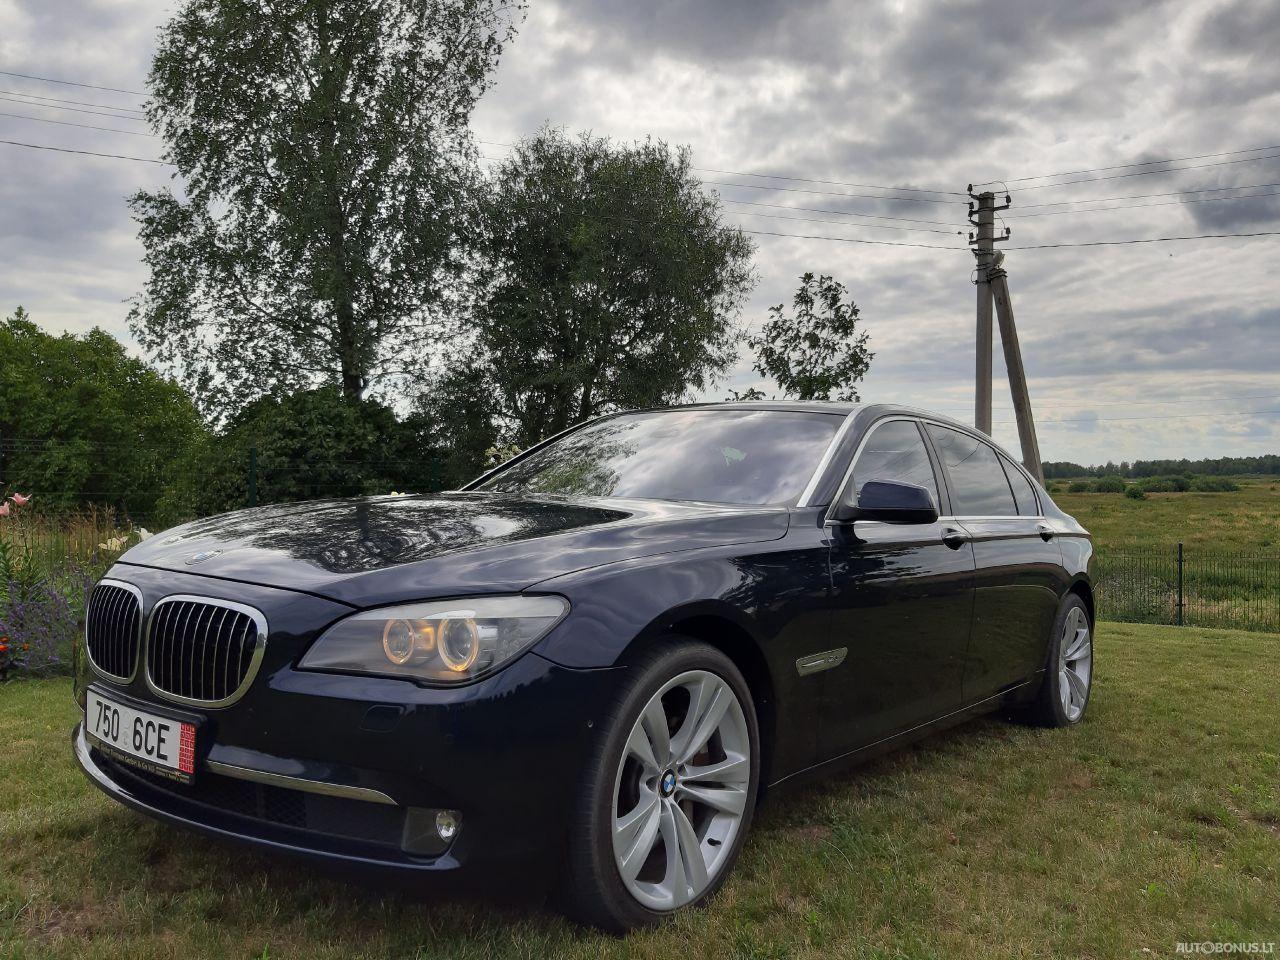 BMW 750, 4.4 l., Седан